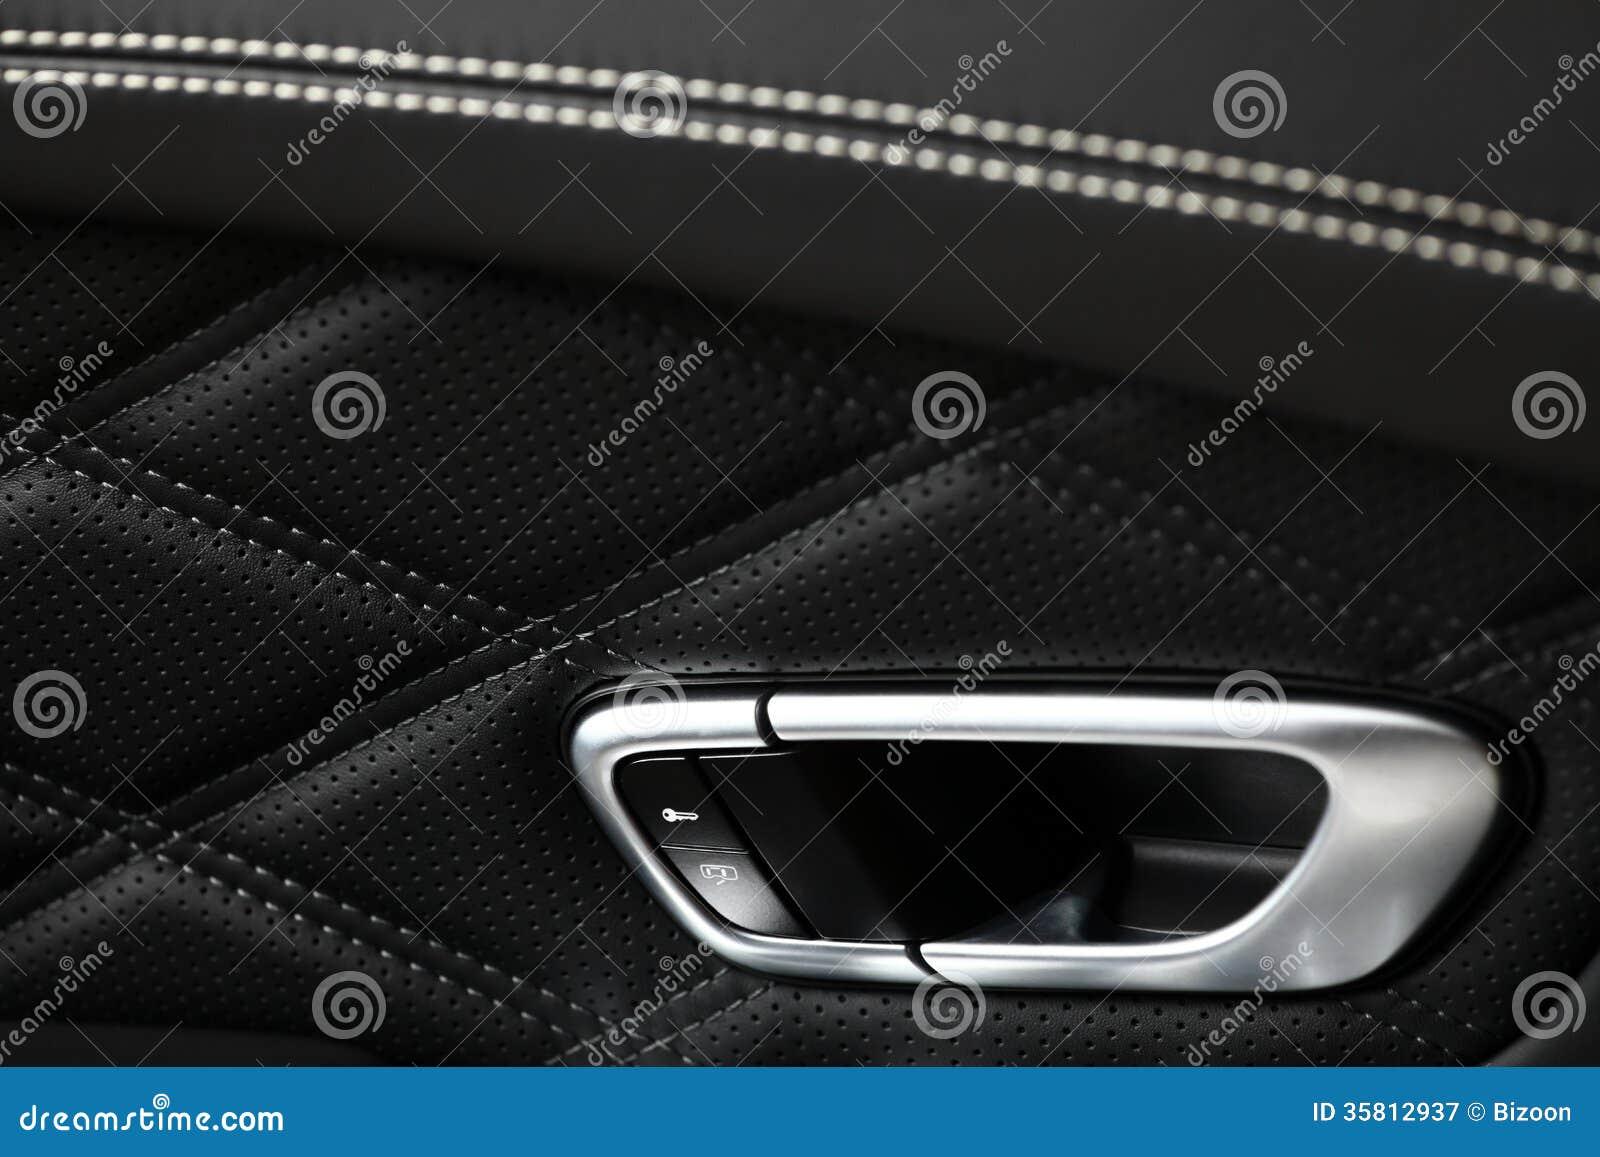 Car Door Opener Royalty Free Stock Photography Image